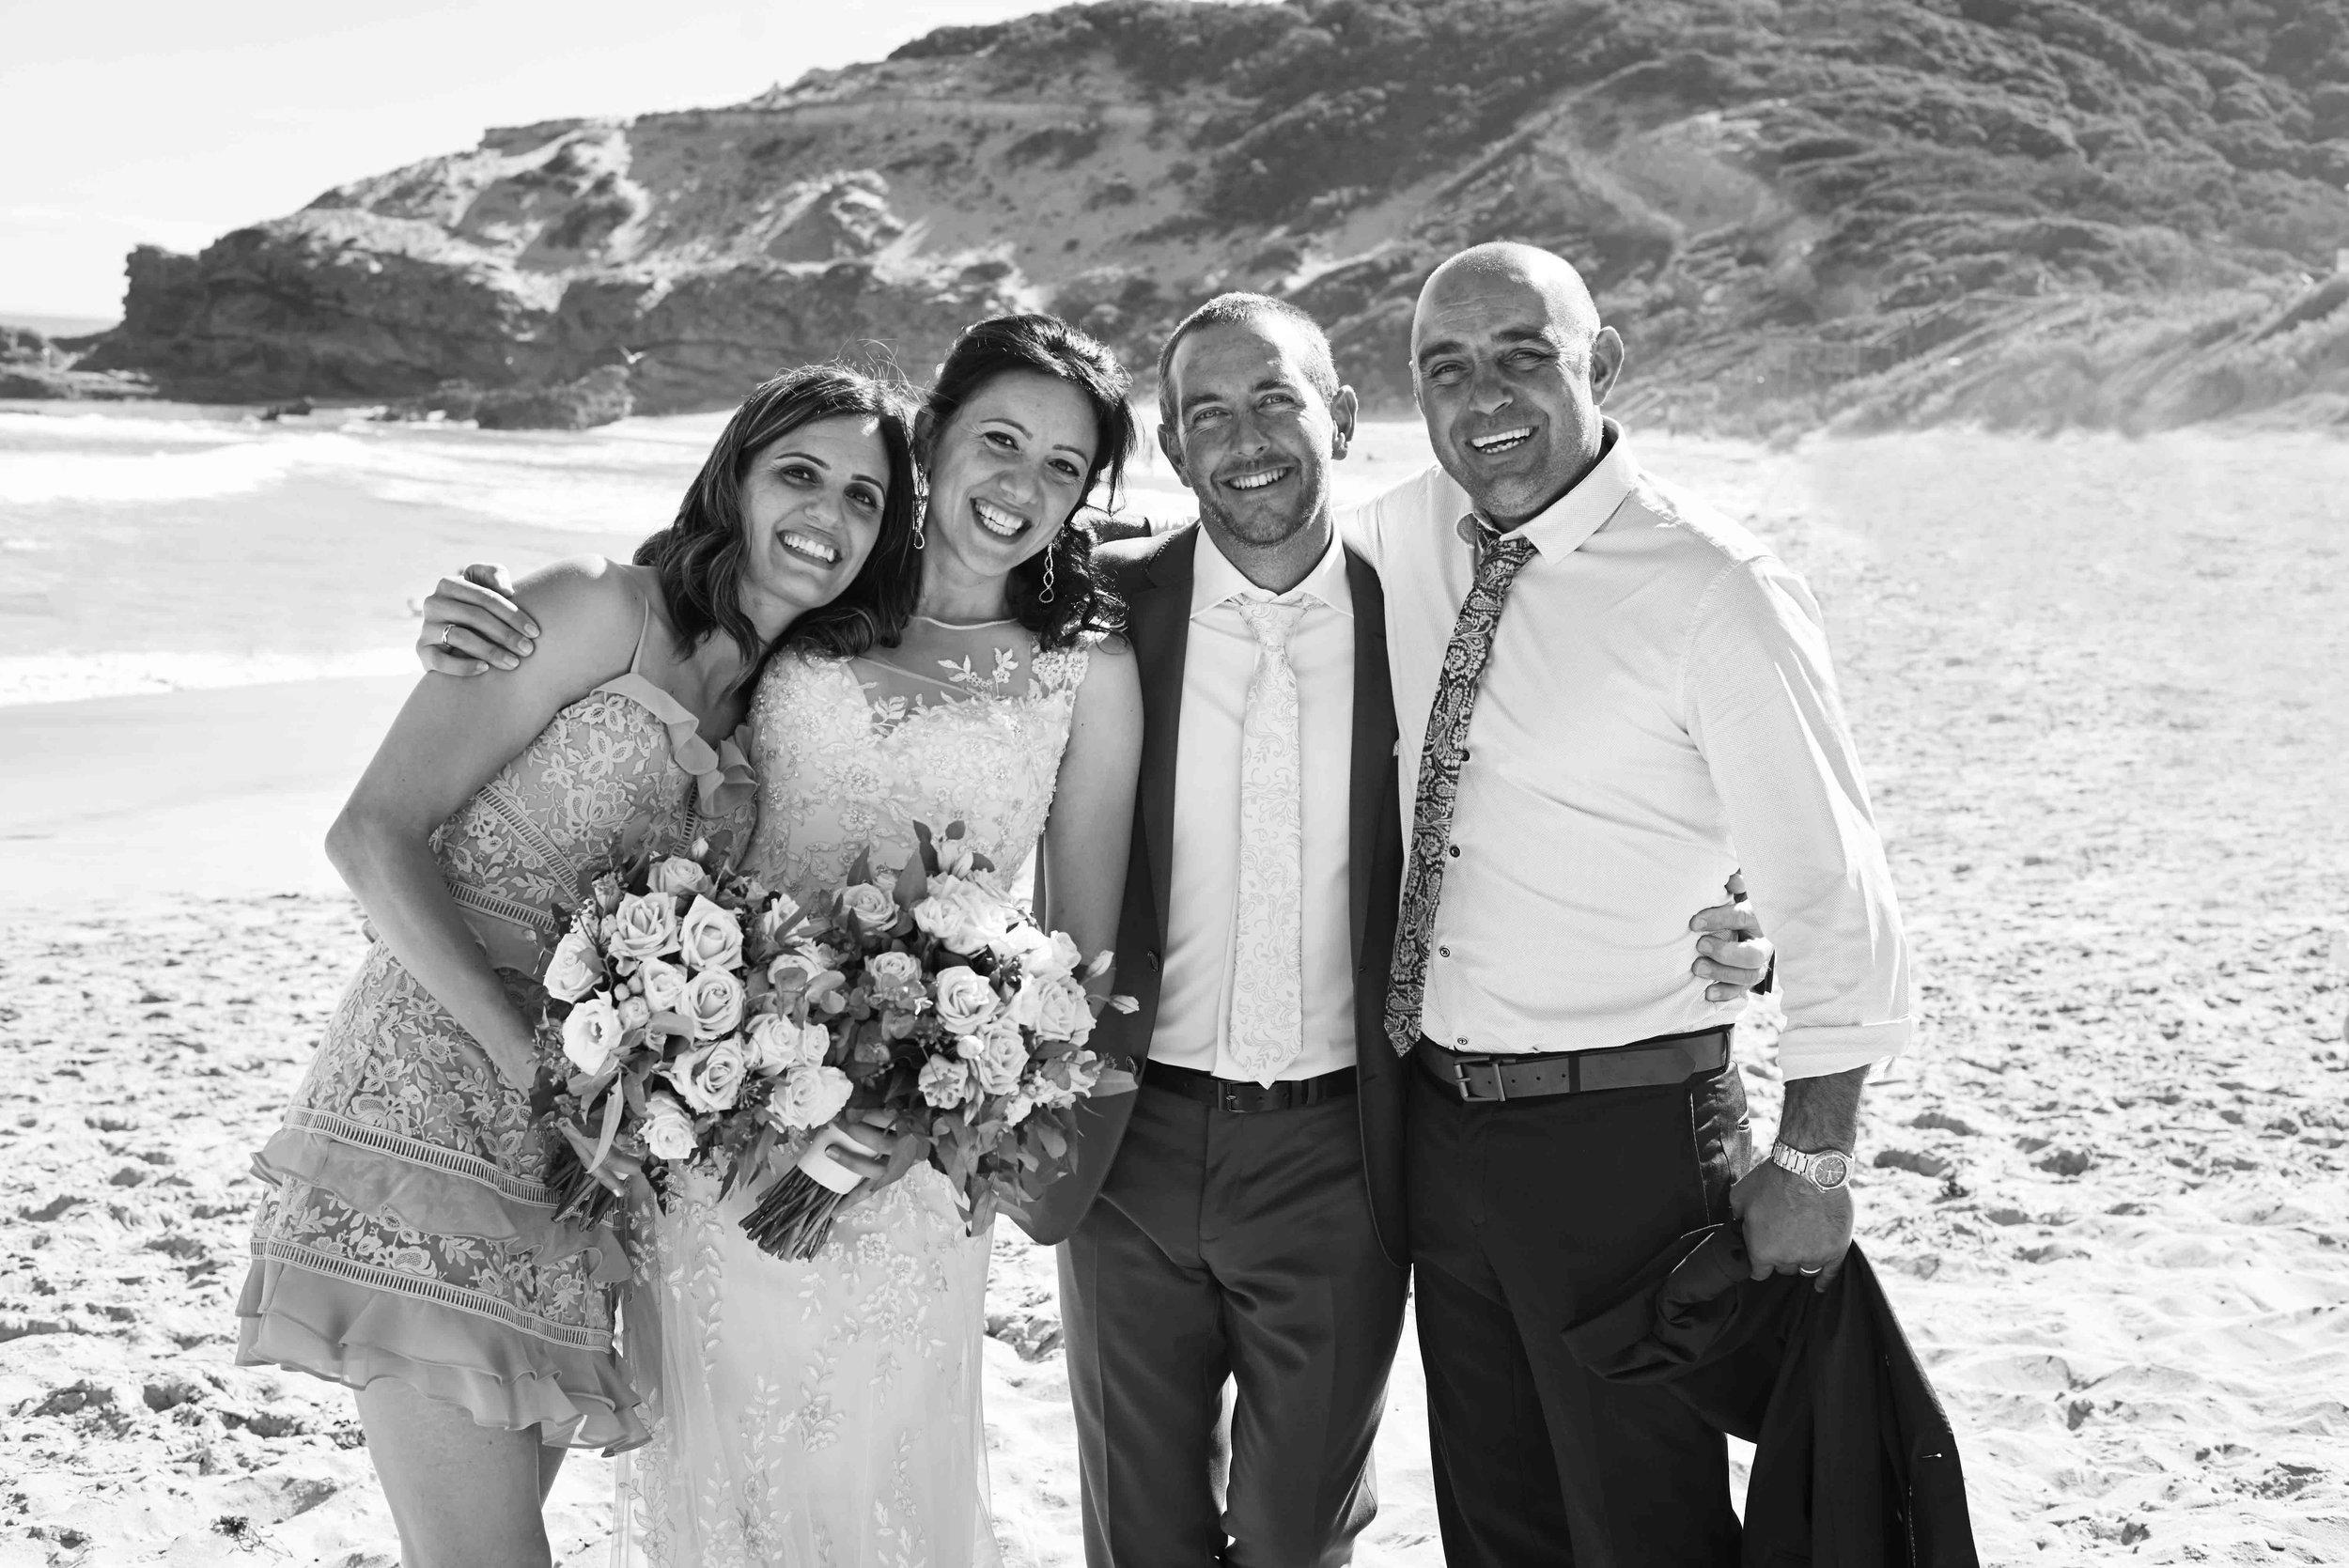 sorrento-wedding-photography-all-smiles-marissa-jade-photography-123.jpg